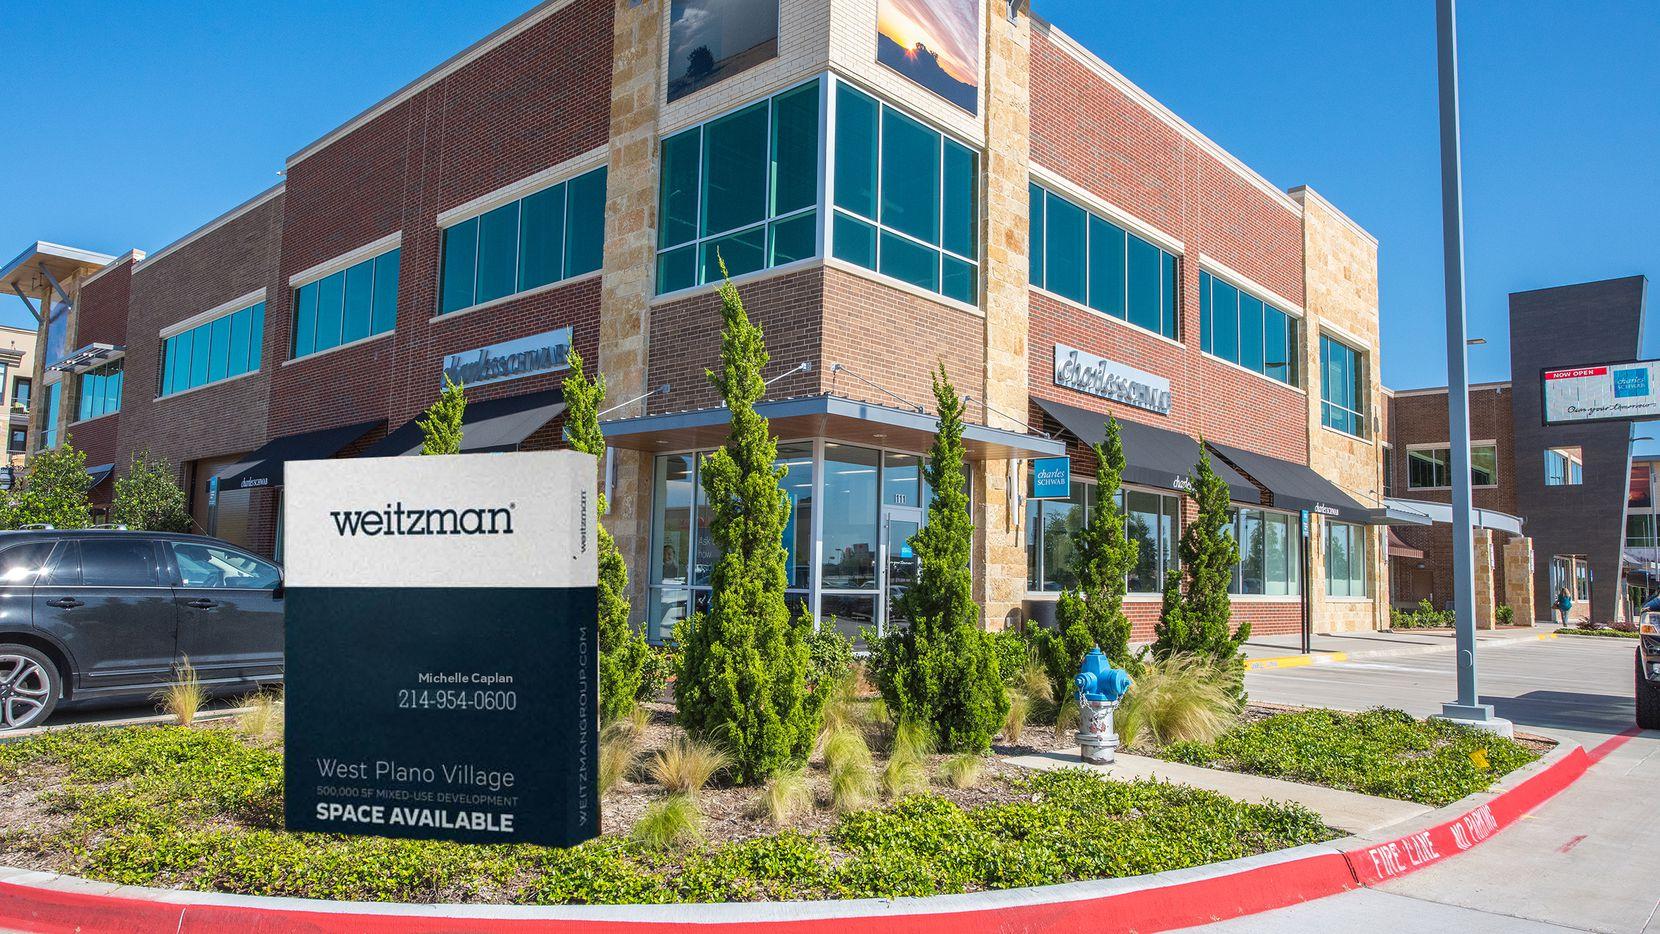 Weitzman has operations across Texas' major markets.